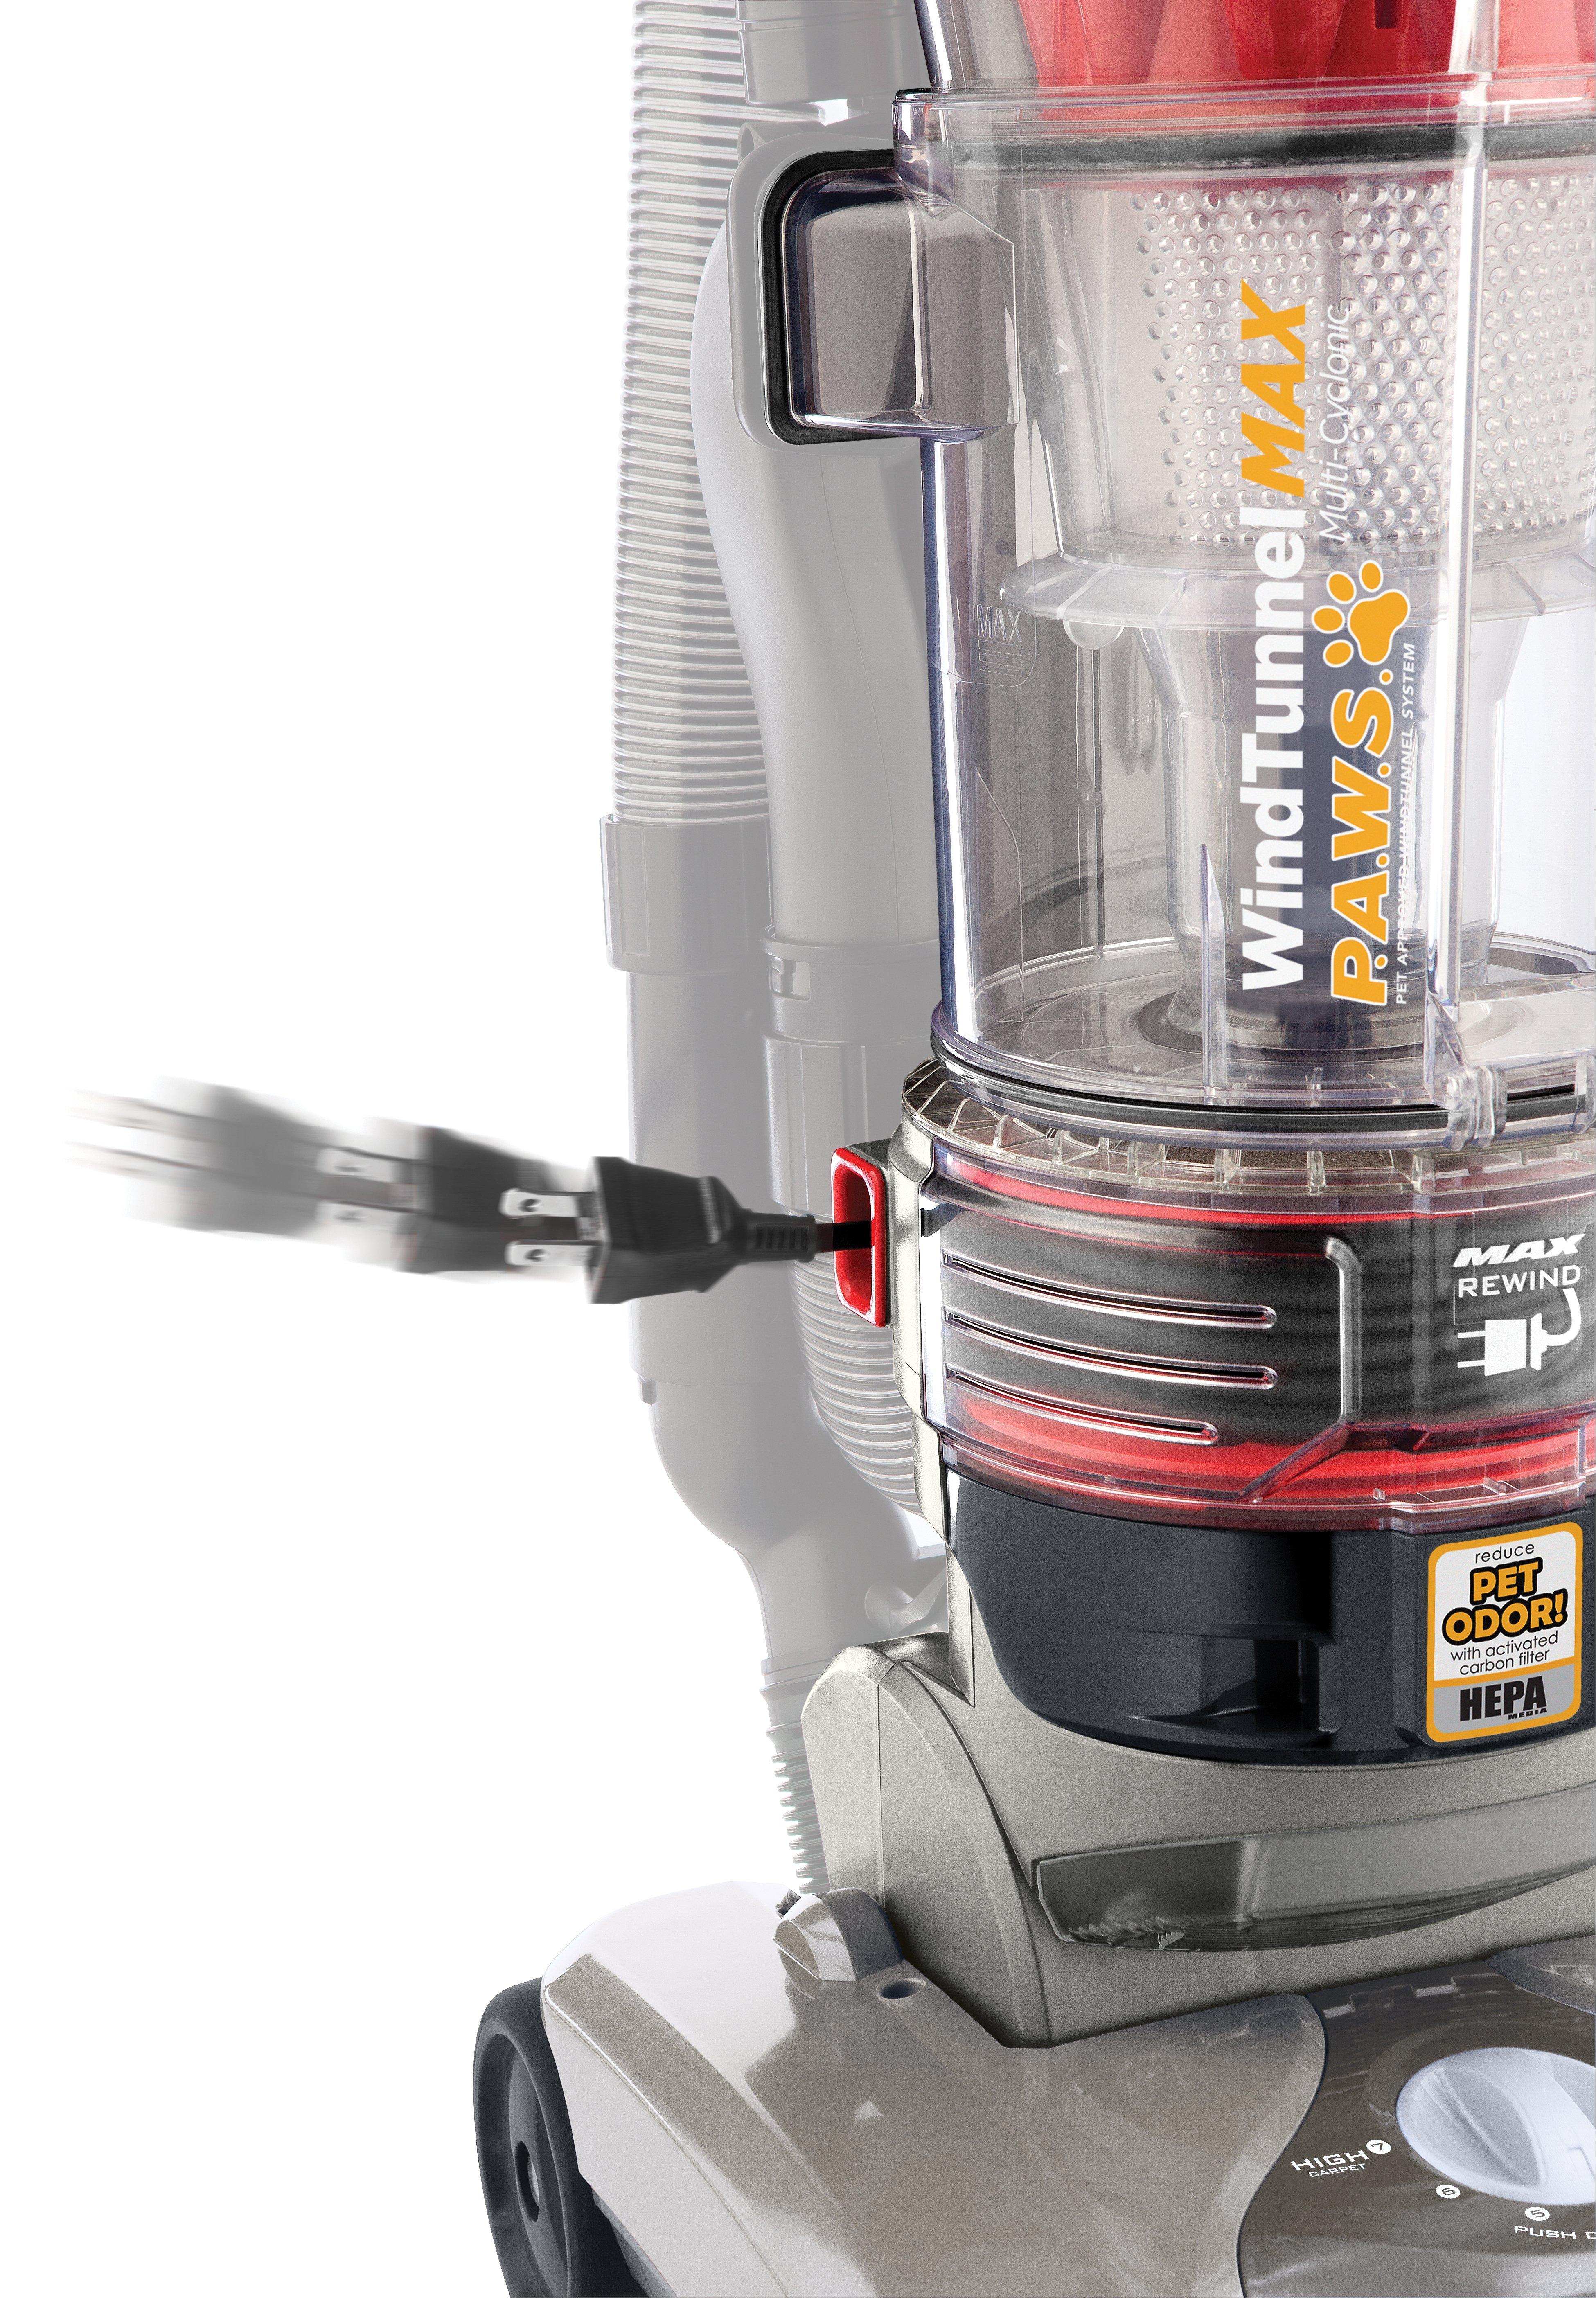 WindTunnel Max Pet T-Series Upright Vacuum8